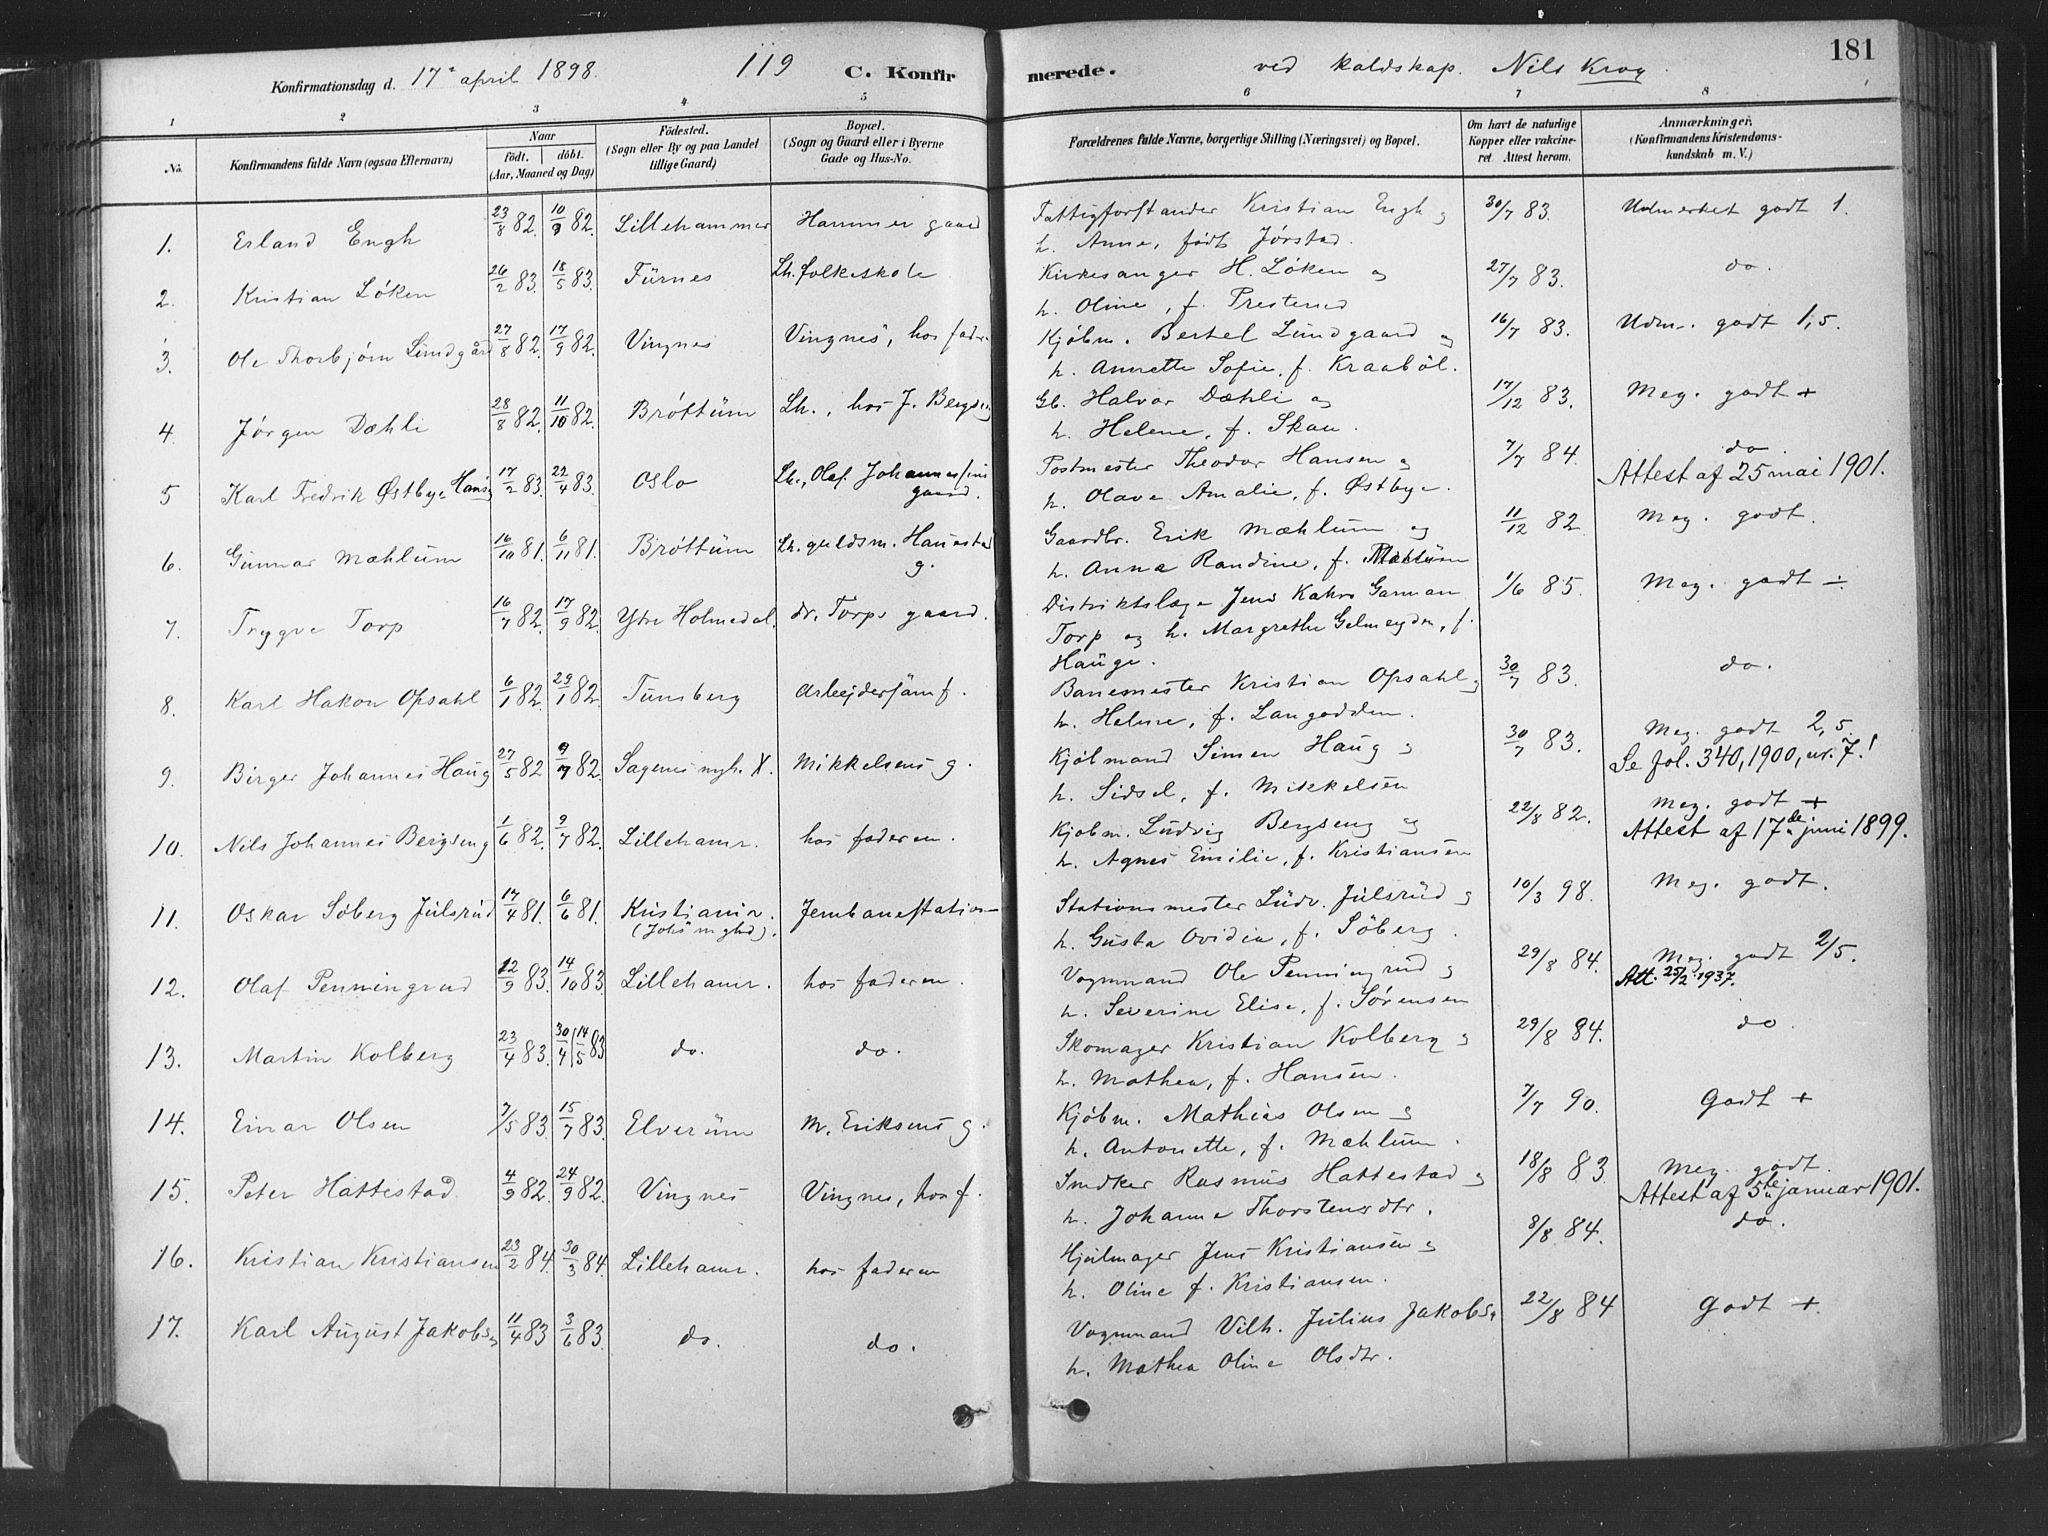 SAH, Fåberg prestekontor, Ministerialbok nr. 10, 1879-1900, s. 181